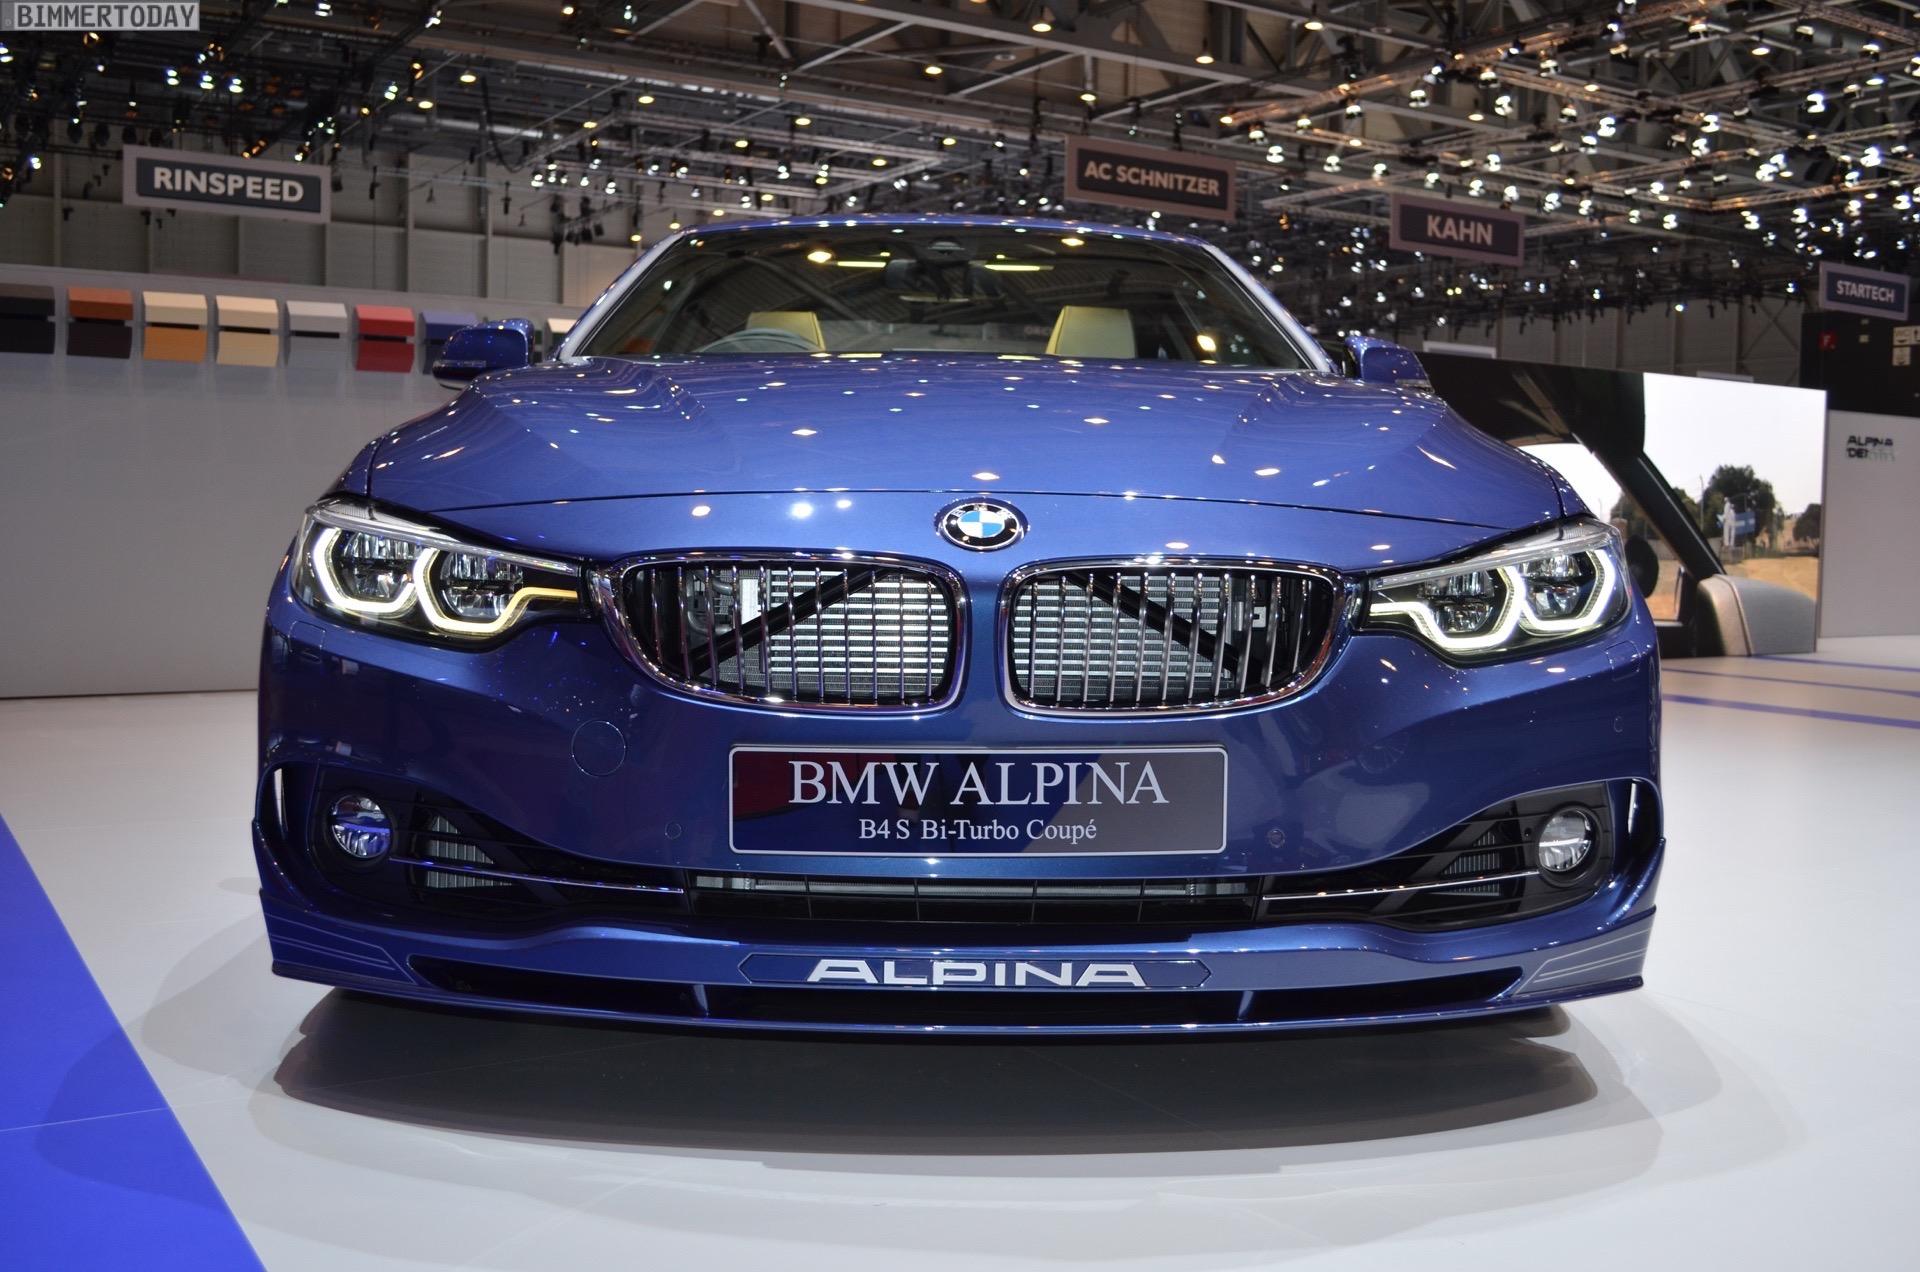 Bmw Old Models >> Alpina B4 S Bi-Turbo Models to Show Up at London Motor Show